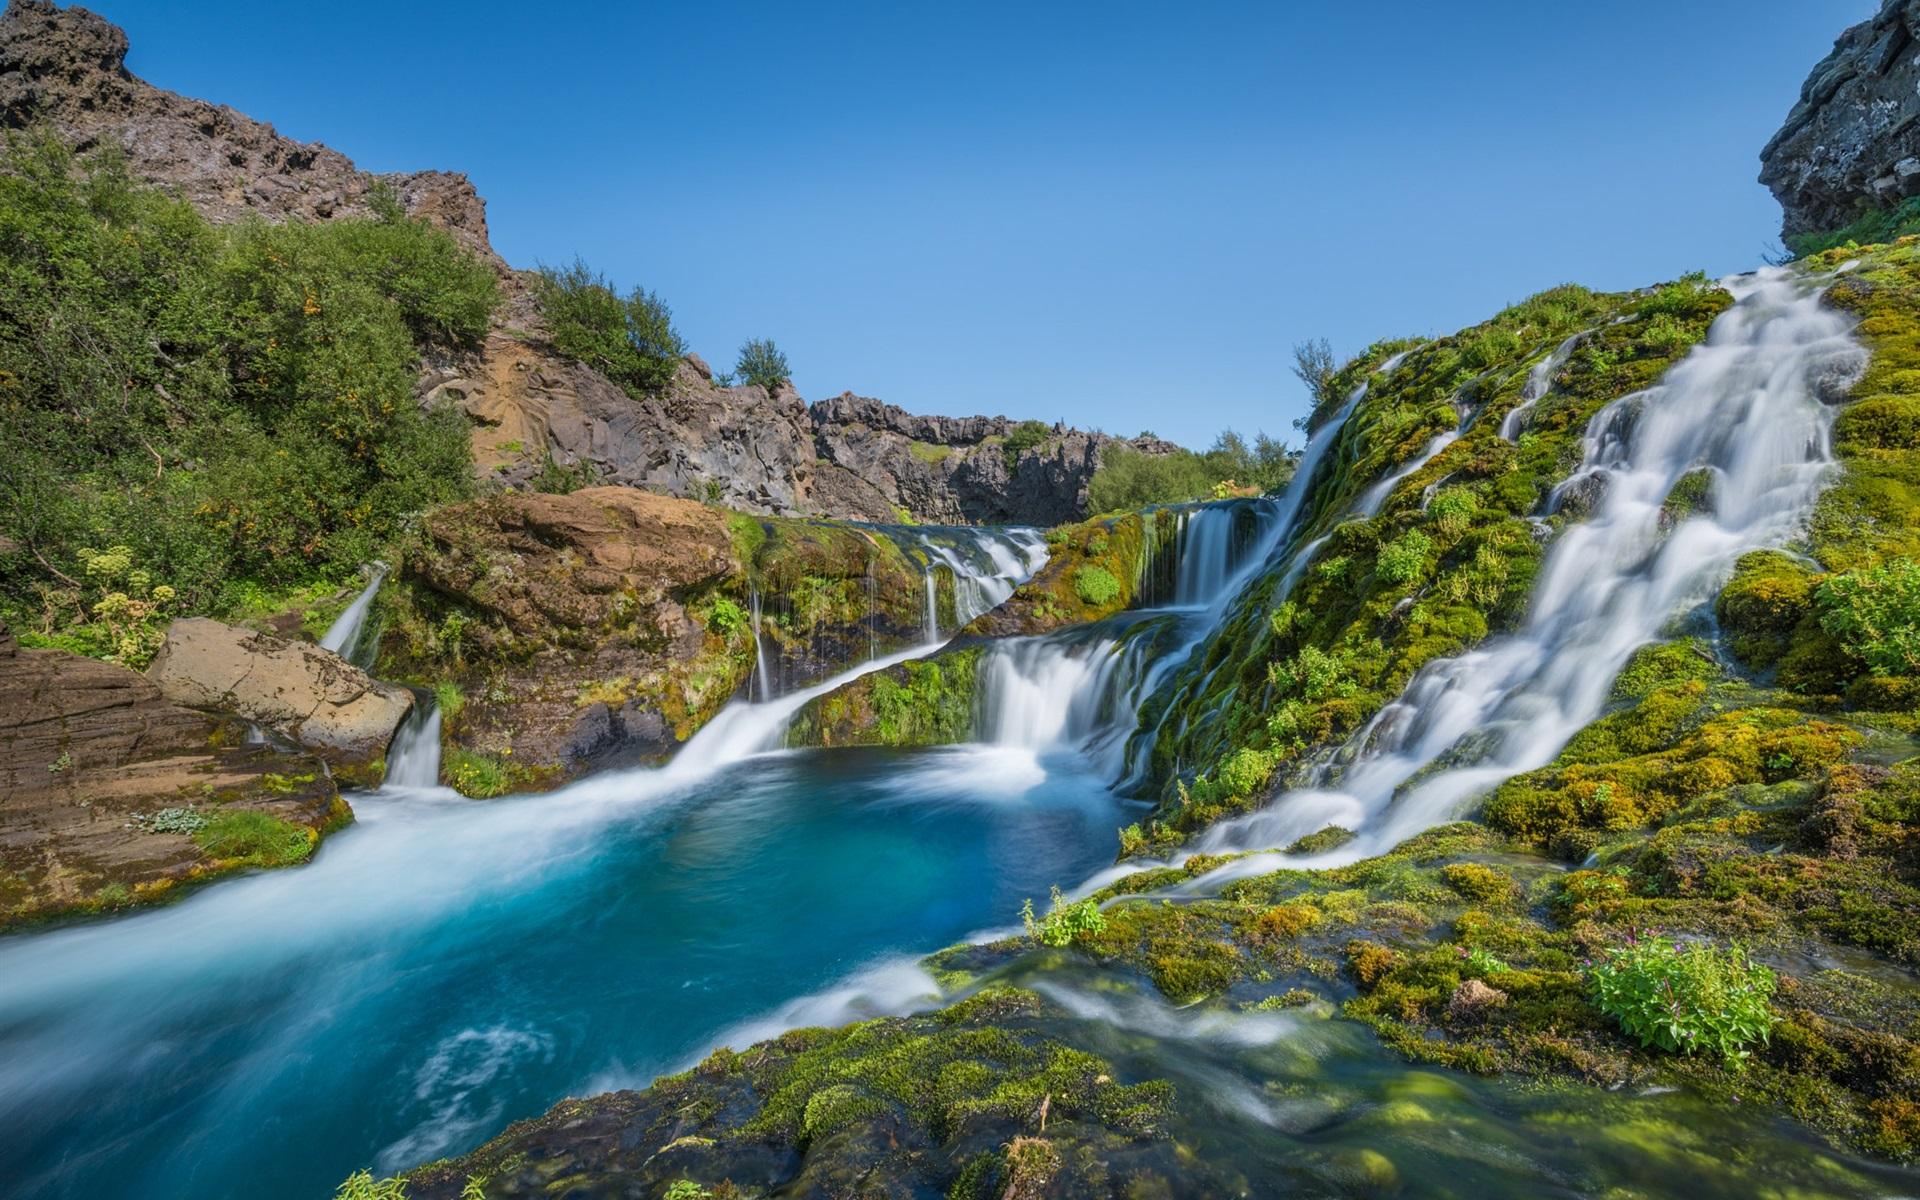 Fondos De Pantalla Islandia, Cascadas, Río, Paisaje De